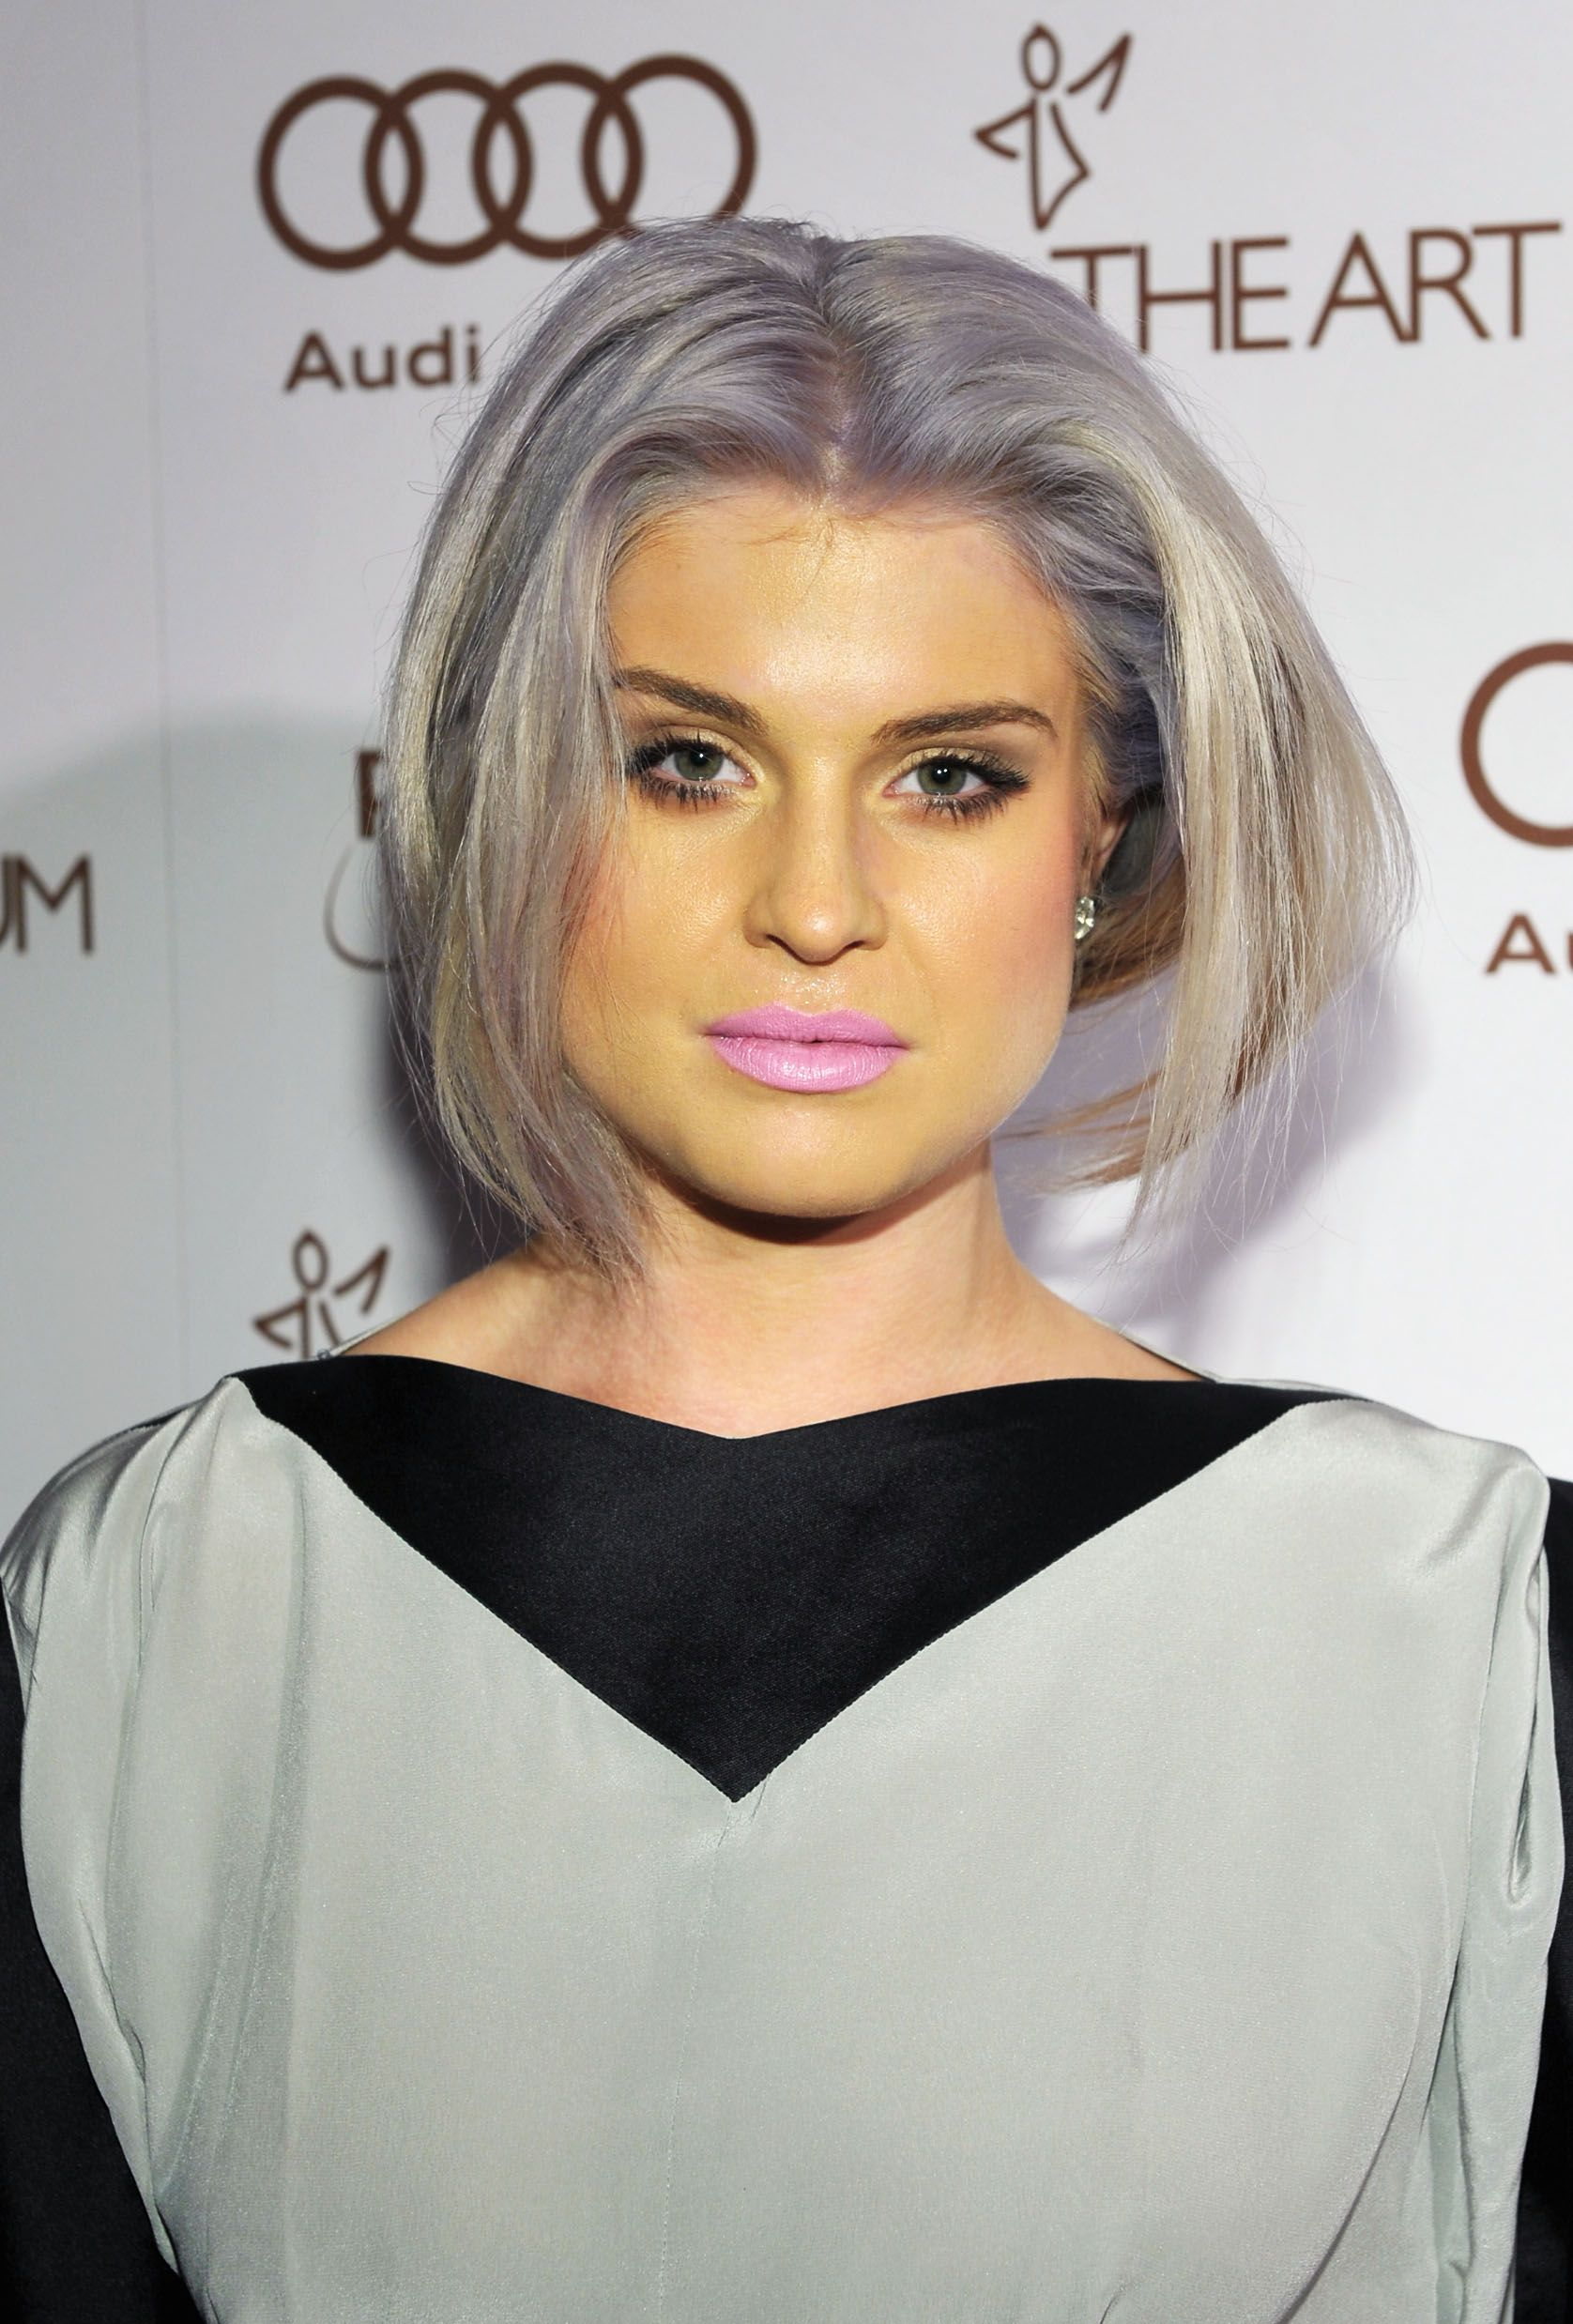 Watch Kelly osbourne admits making appalling music video